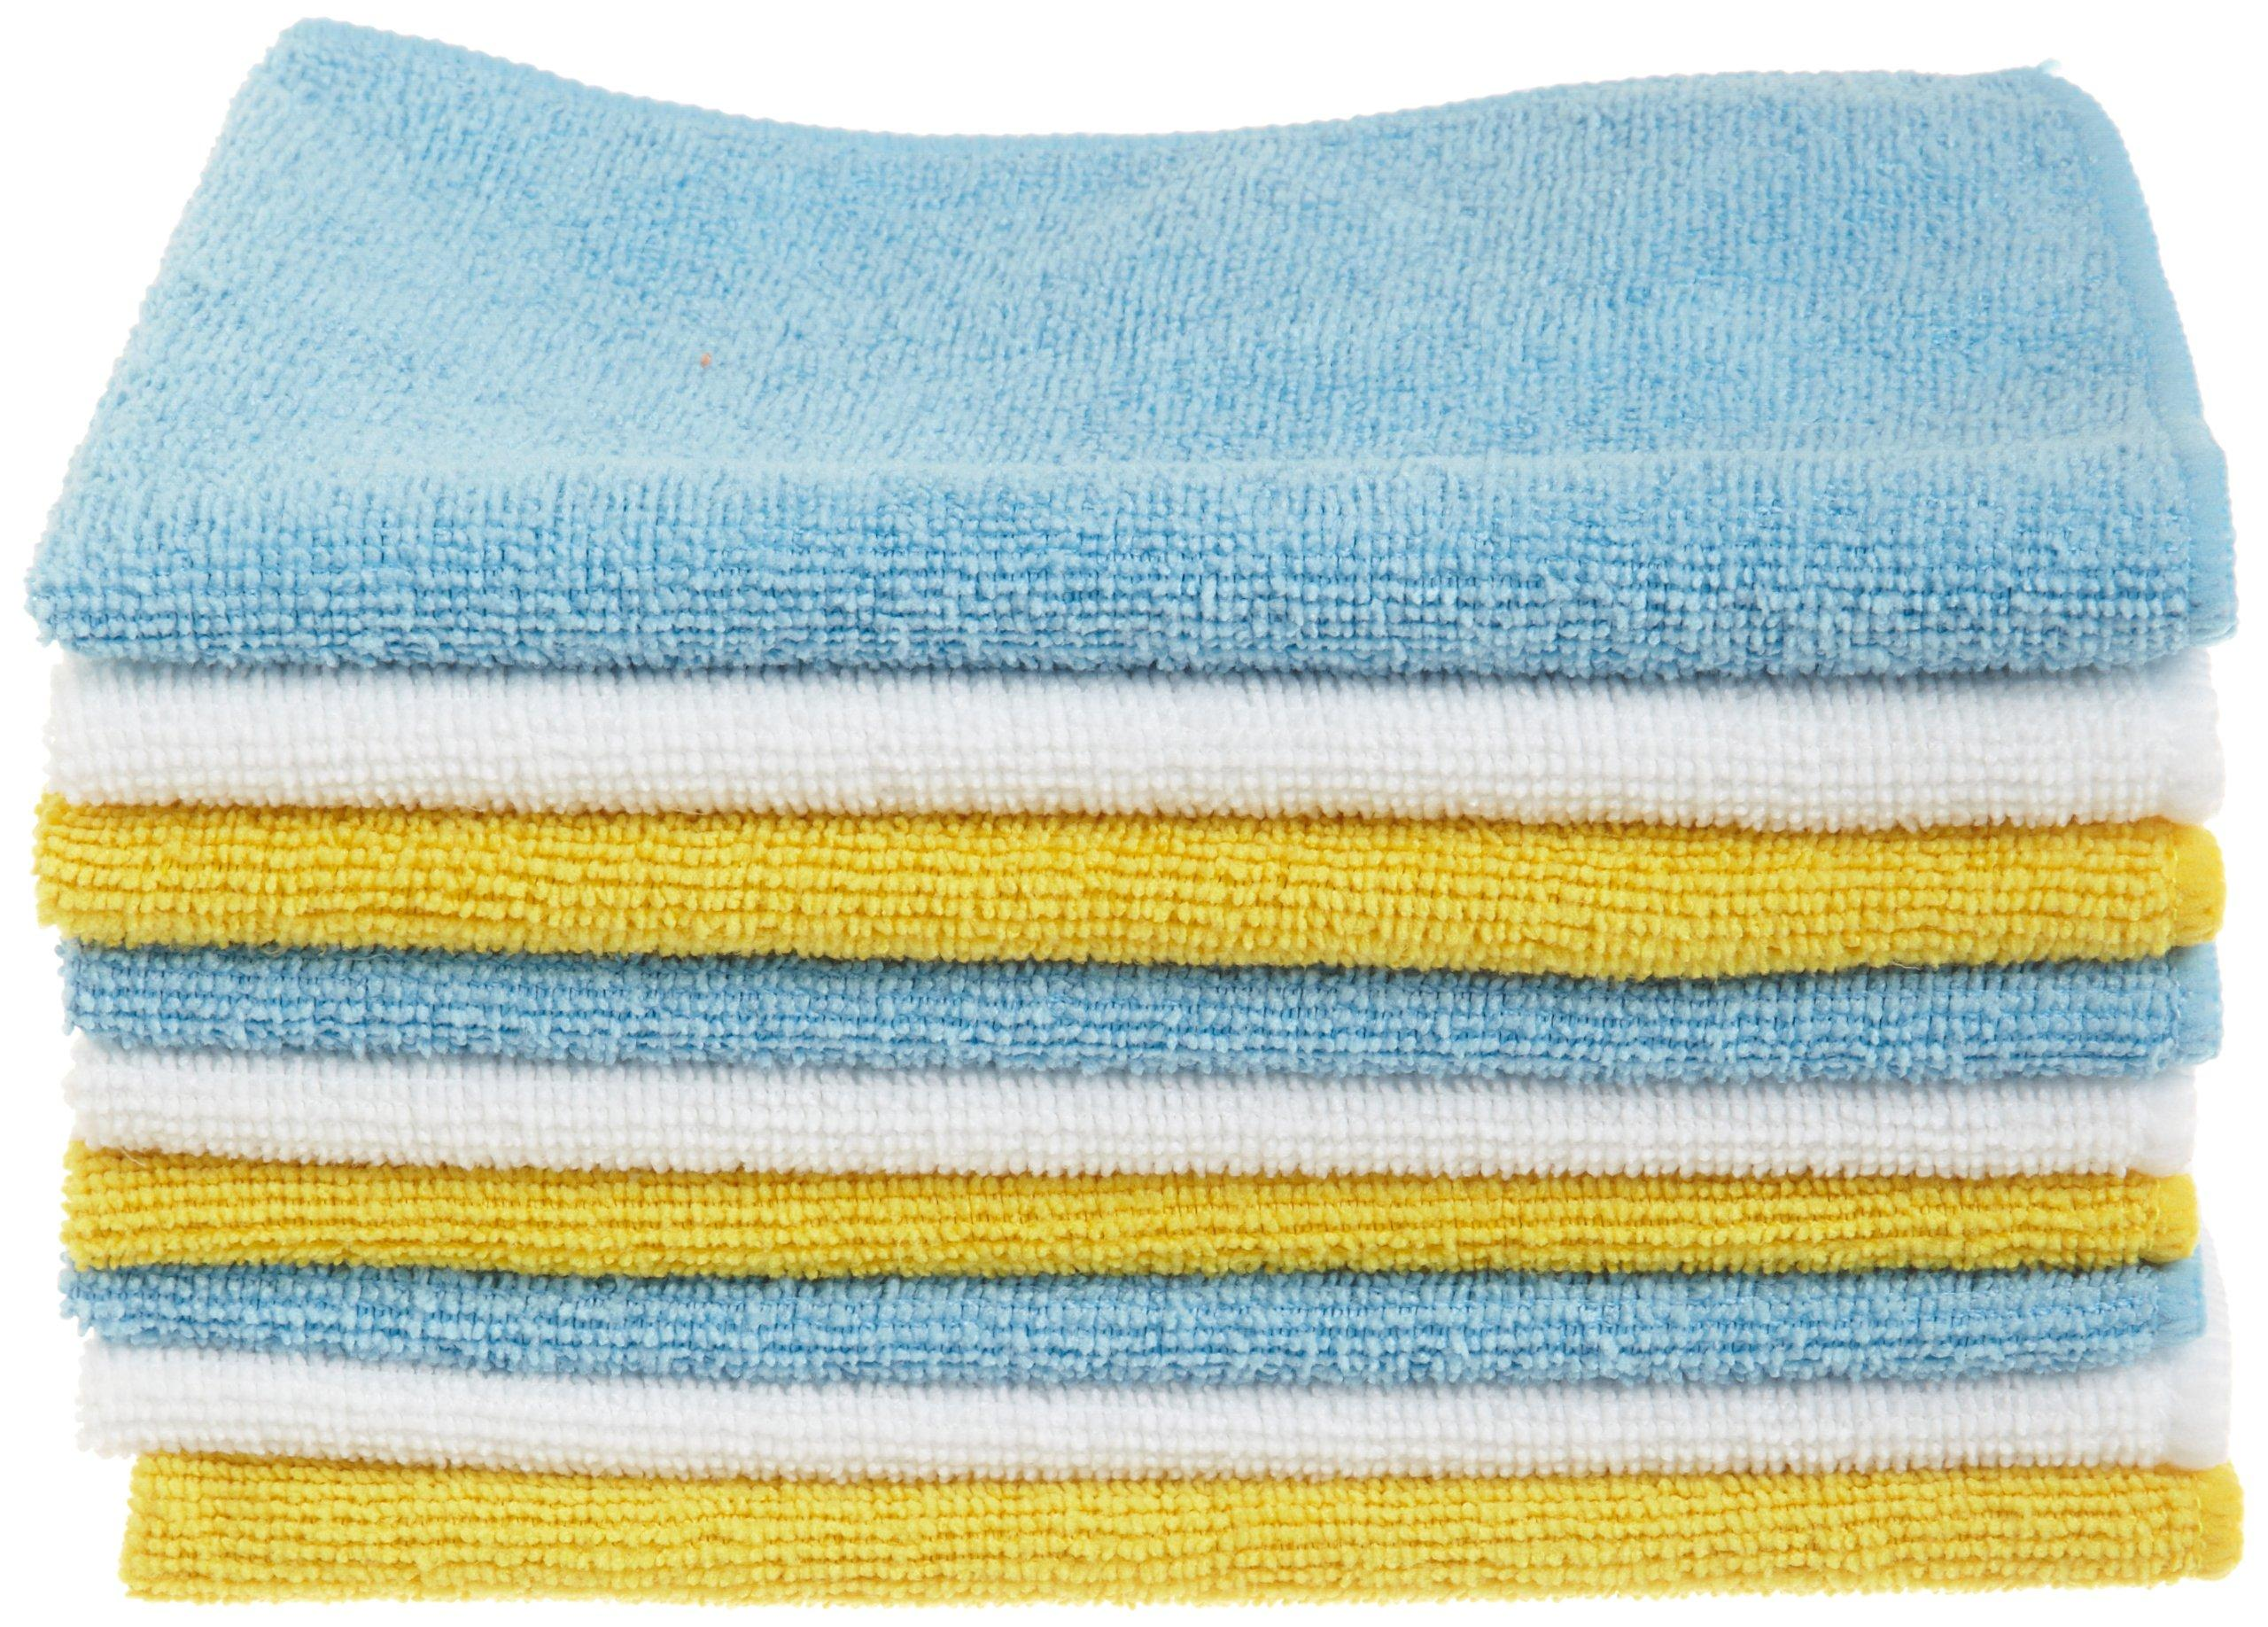 Amazon.com: AmazonBasics Microfiber Cleaning Cloth - 24-Pack: Automotive